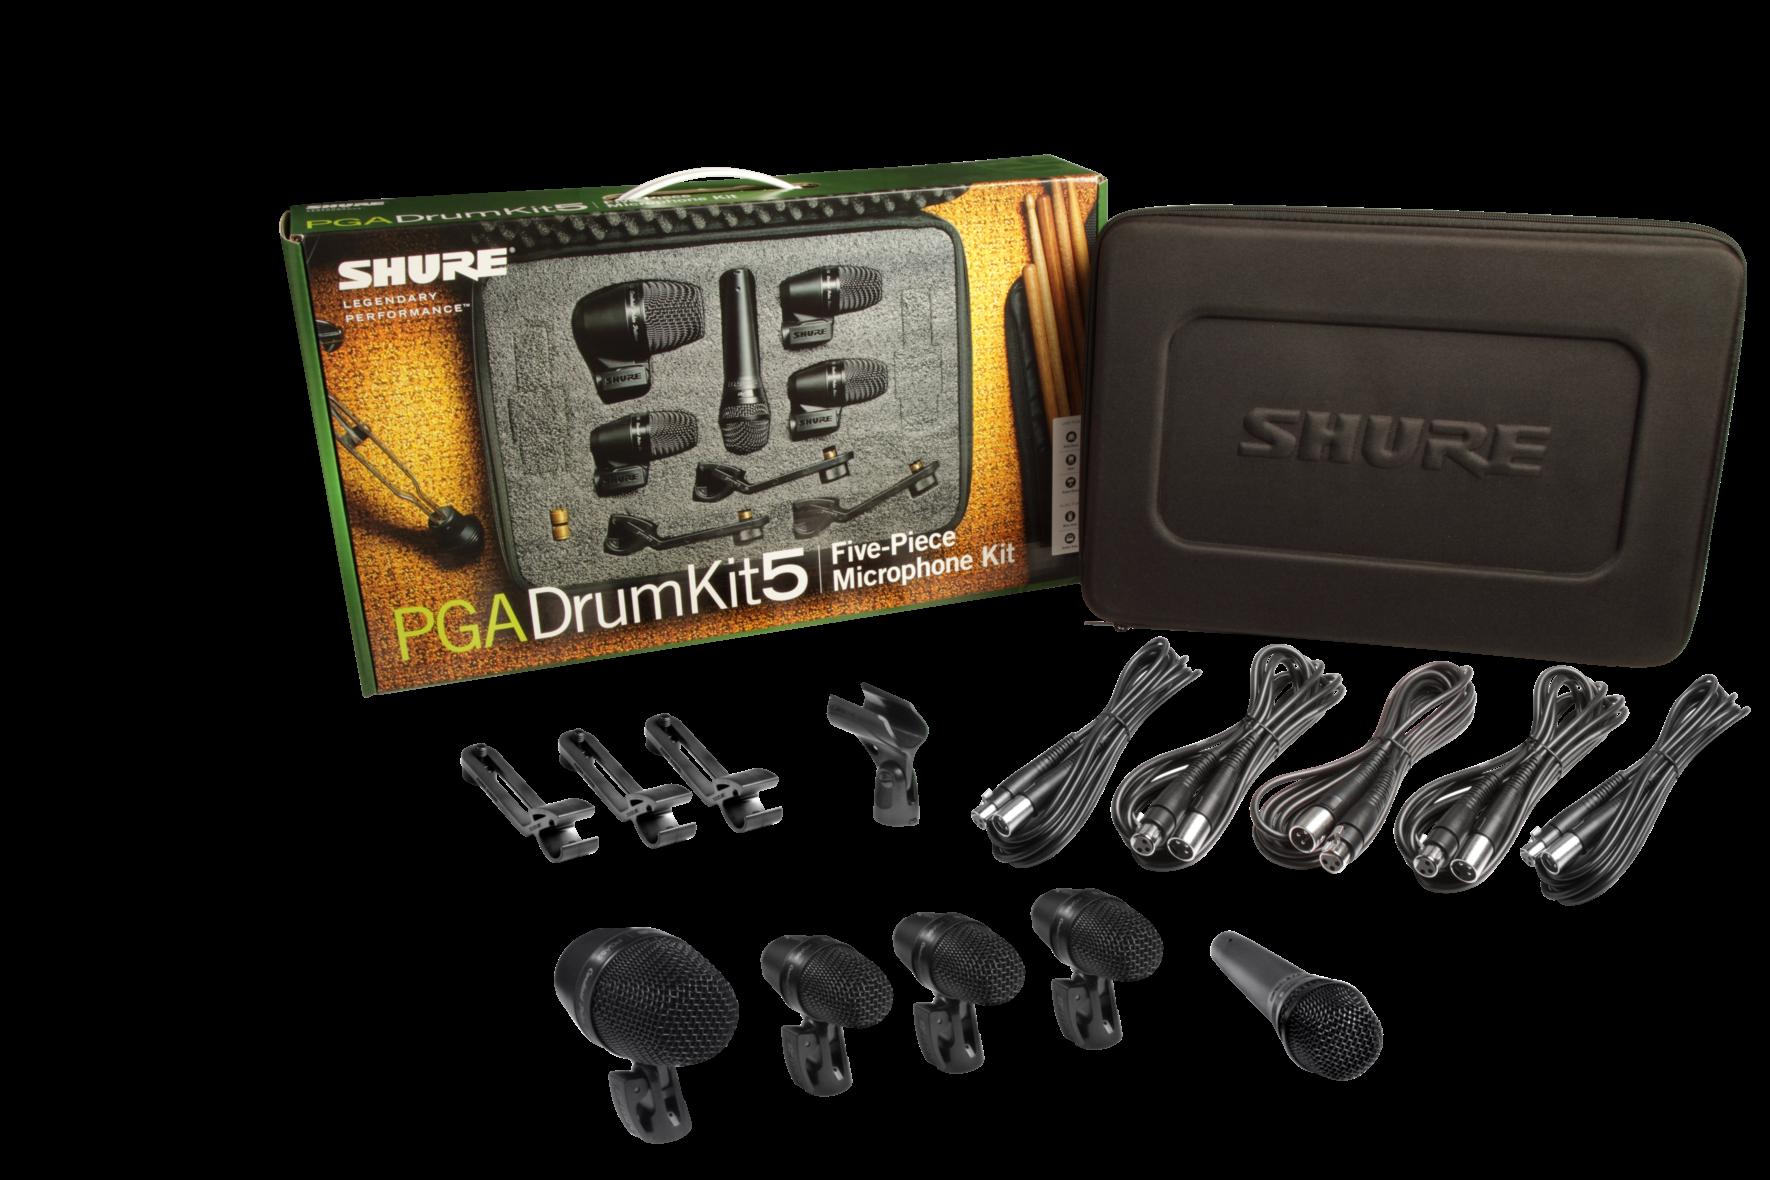 SHURE PGA DRUM KIT 5 DRUM MICROPHONE PACK